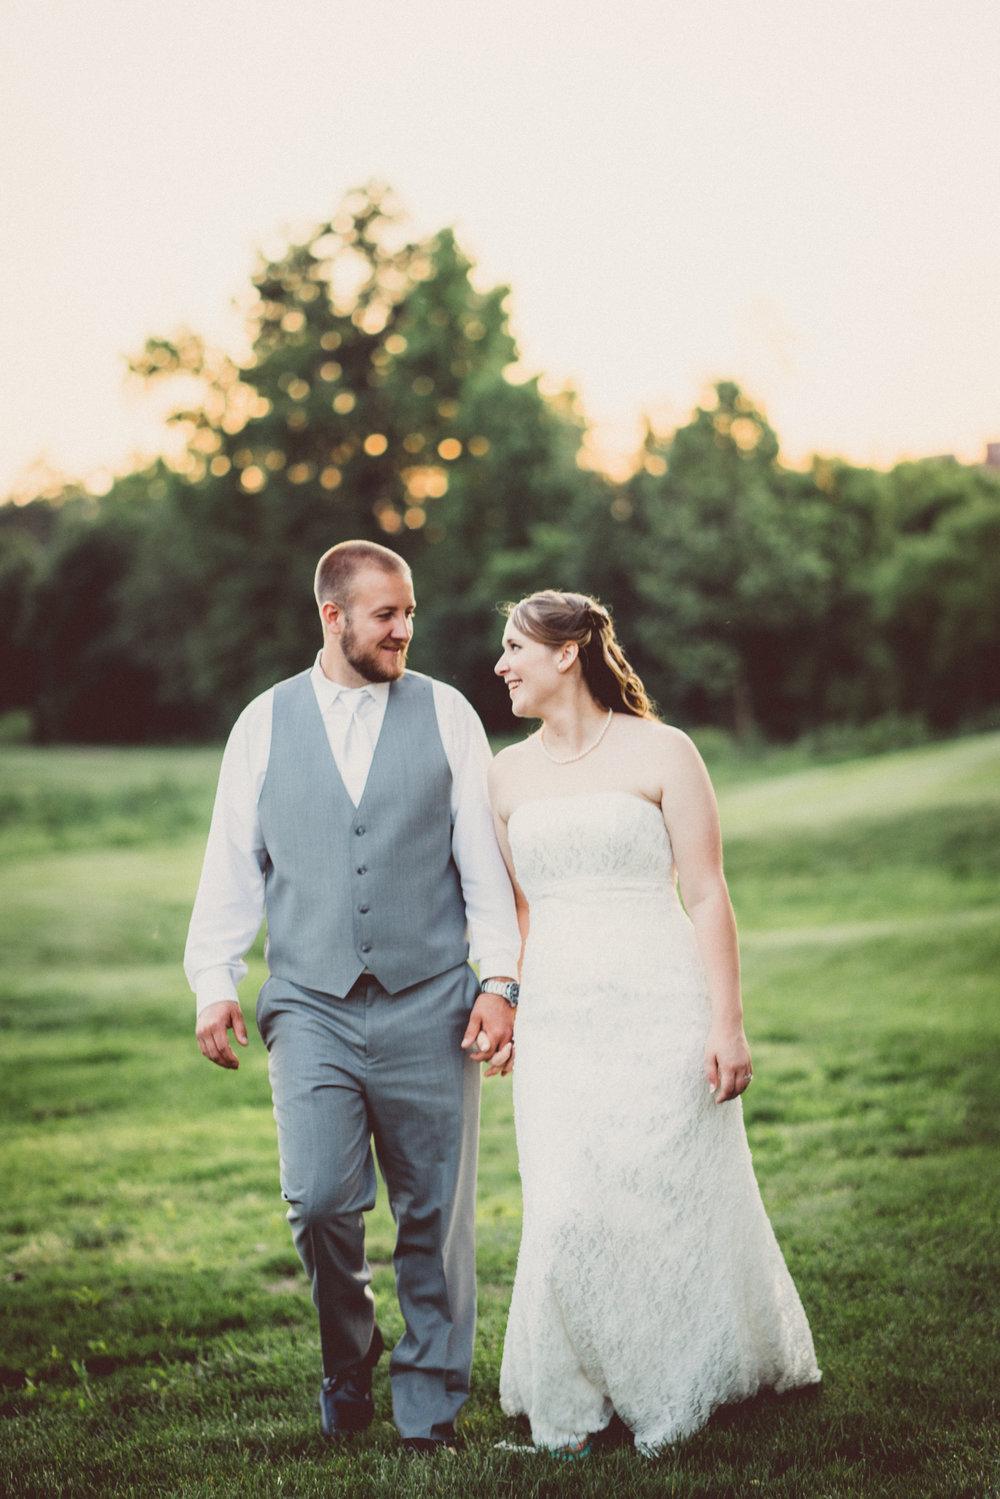 Mike_Steinmetz_Virginia_Wedding_Photographer_Favorites-22.jpg